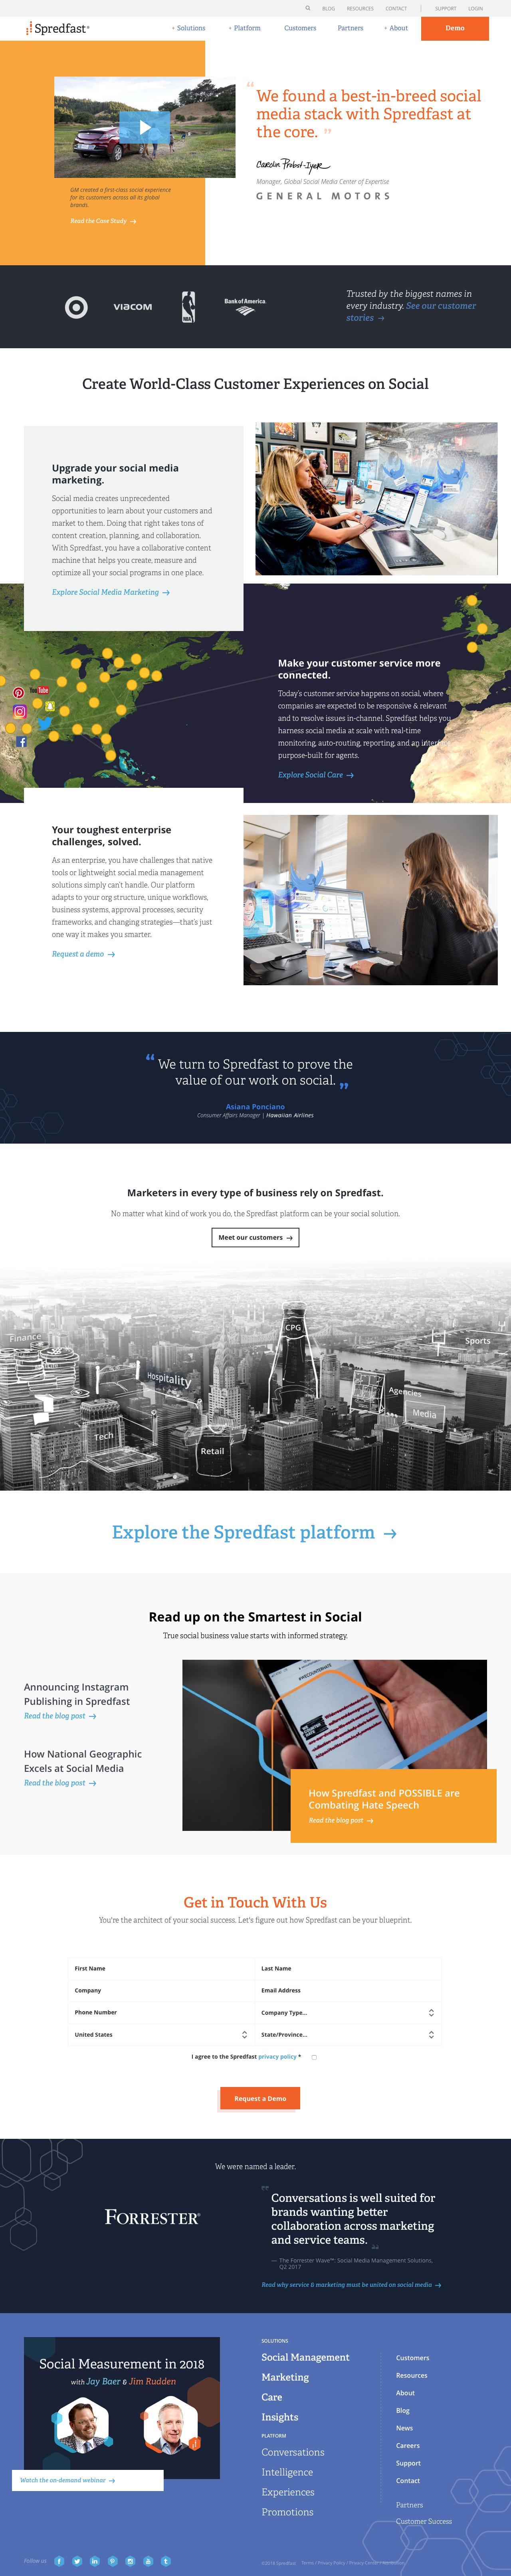 Screenshot of spredfast.com - Social Media Marketing & Management Software | Spredfast - captured Feb. 26, 2018